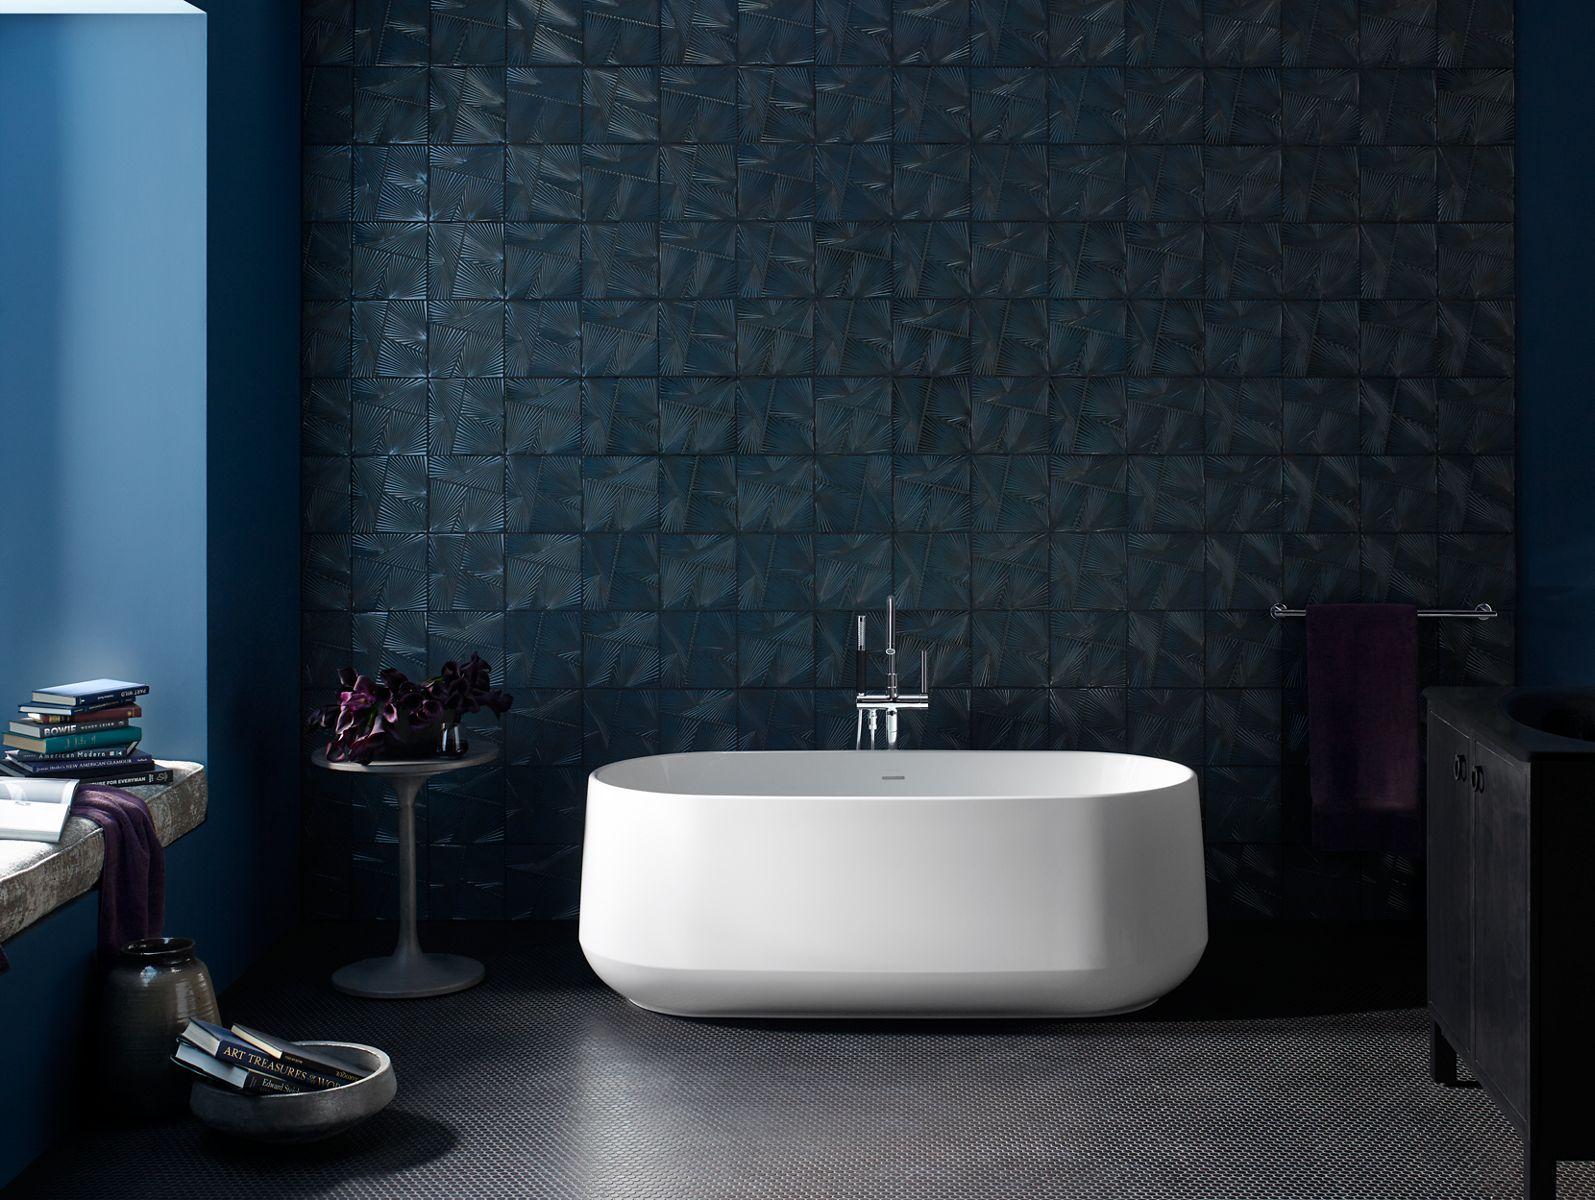 Whirlpools Bathtubs Whirlpool Bathing Products Bathroom